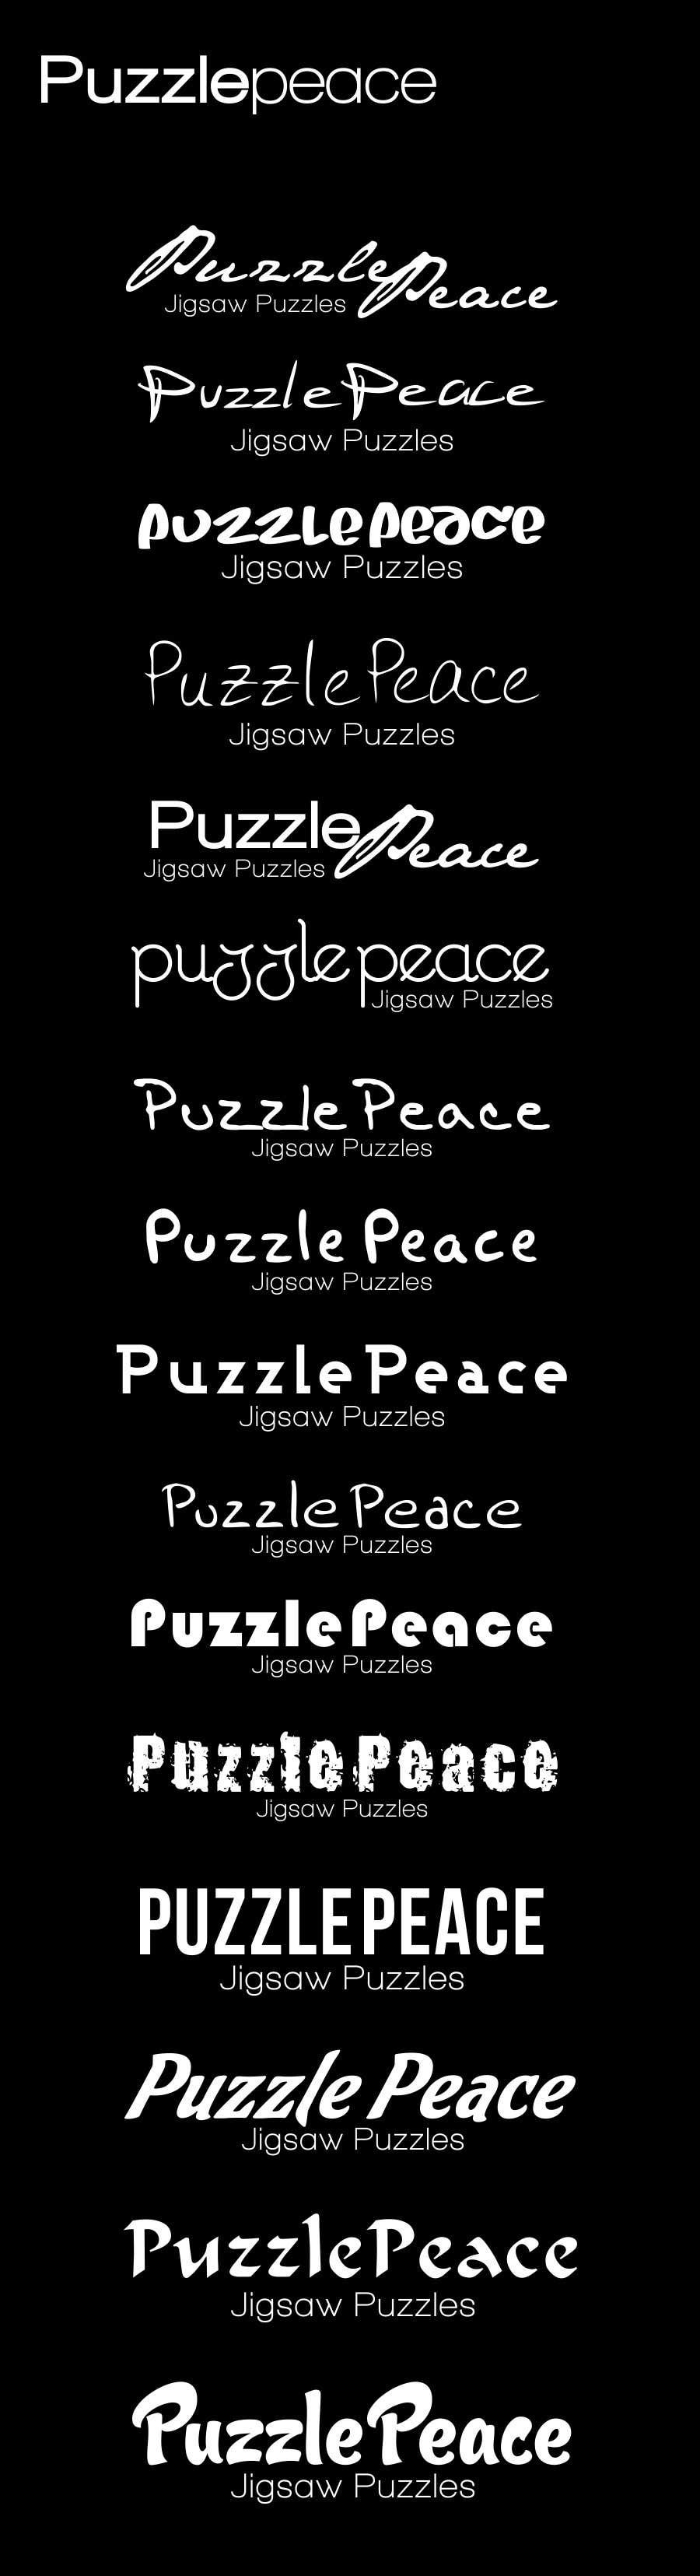 Bài tham dự cuộc thi #145 cho Logo Design for Puzzlepeace